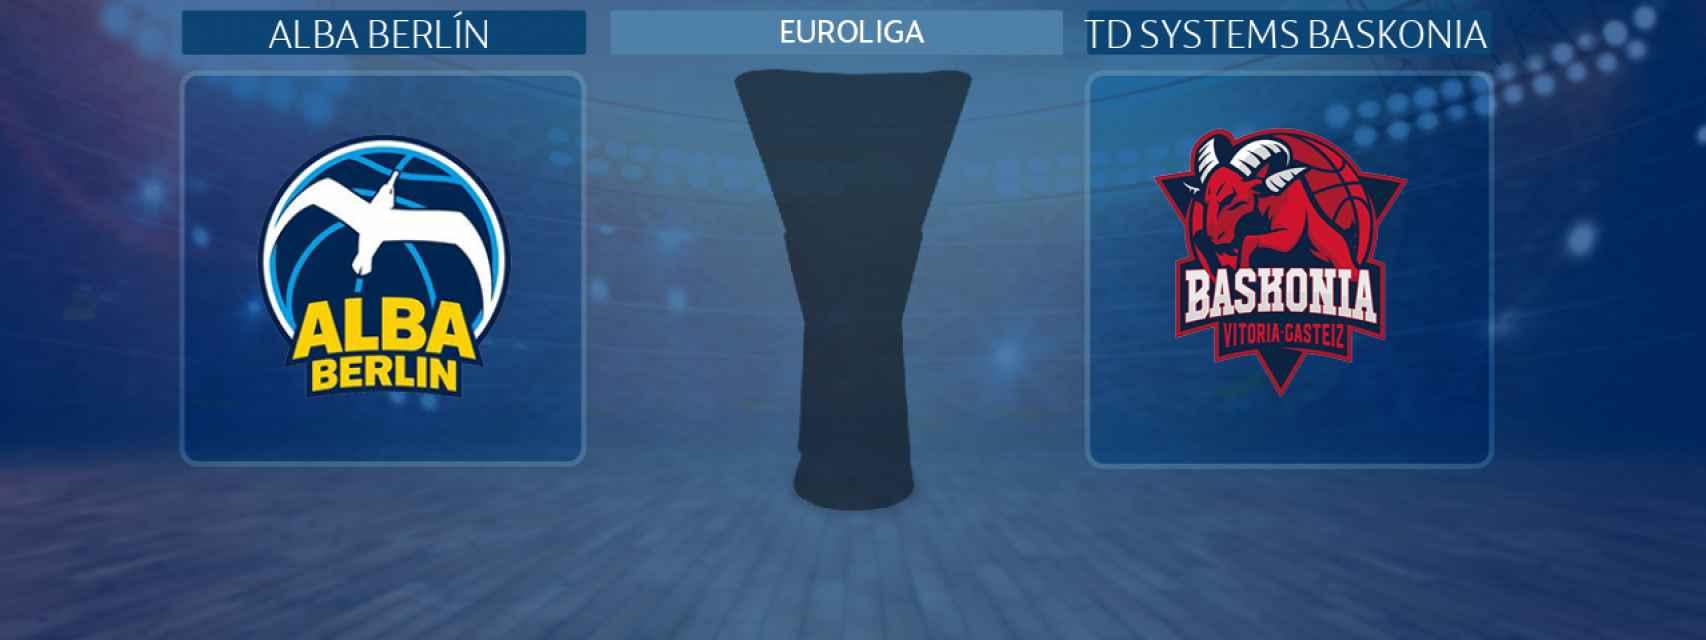 Alba Berlín - TD Systems Baskonia, partido de la Euroliga